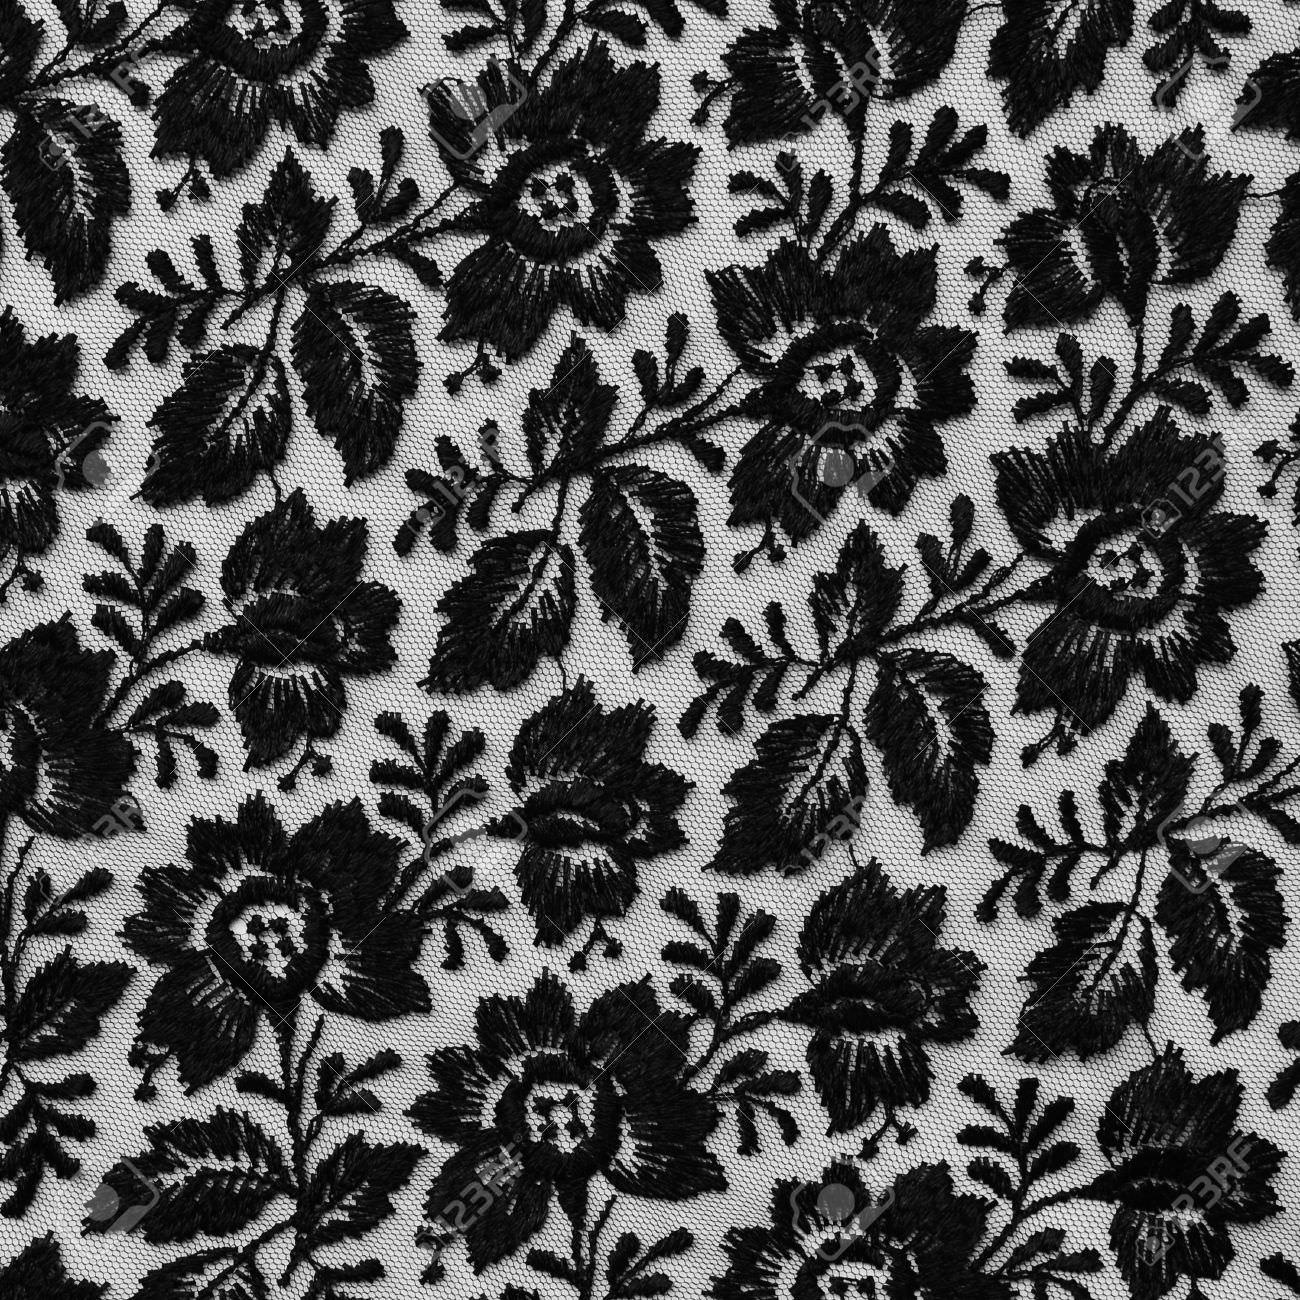 black lace fabric texture design